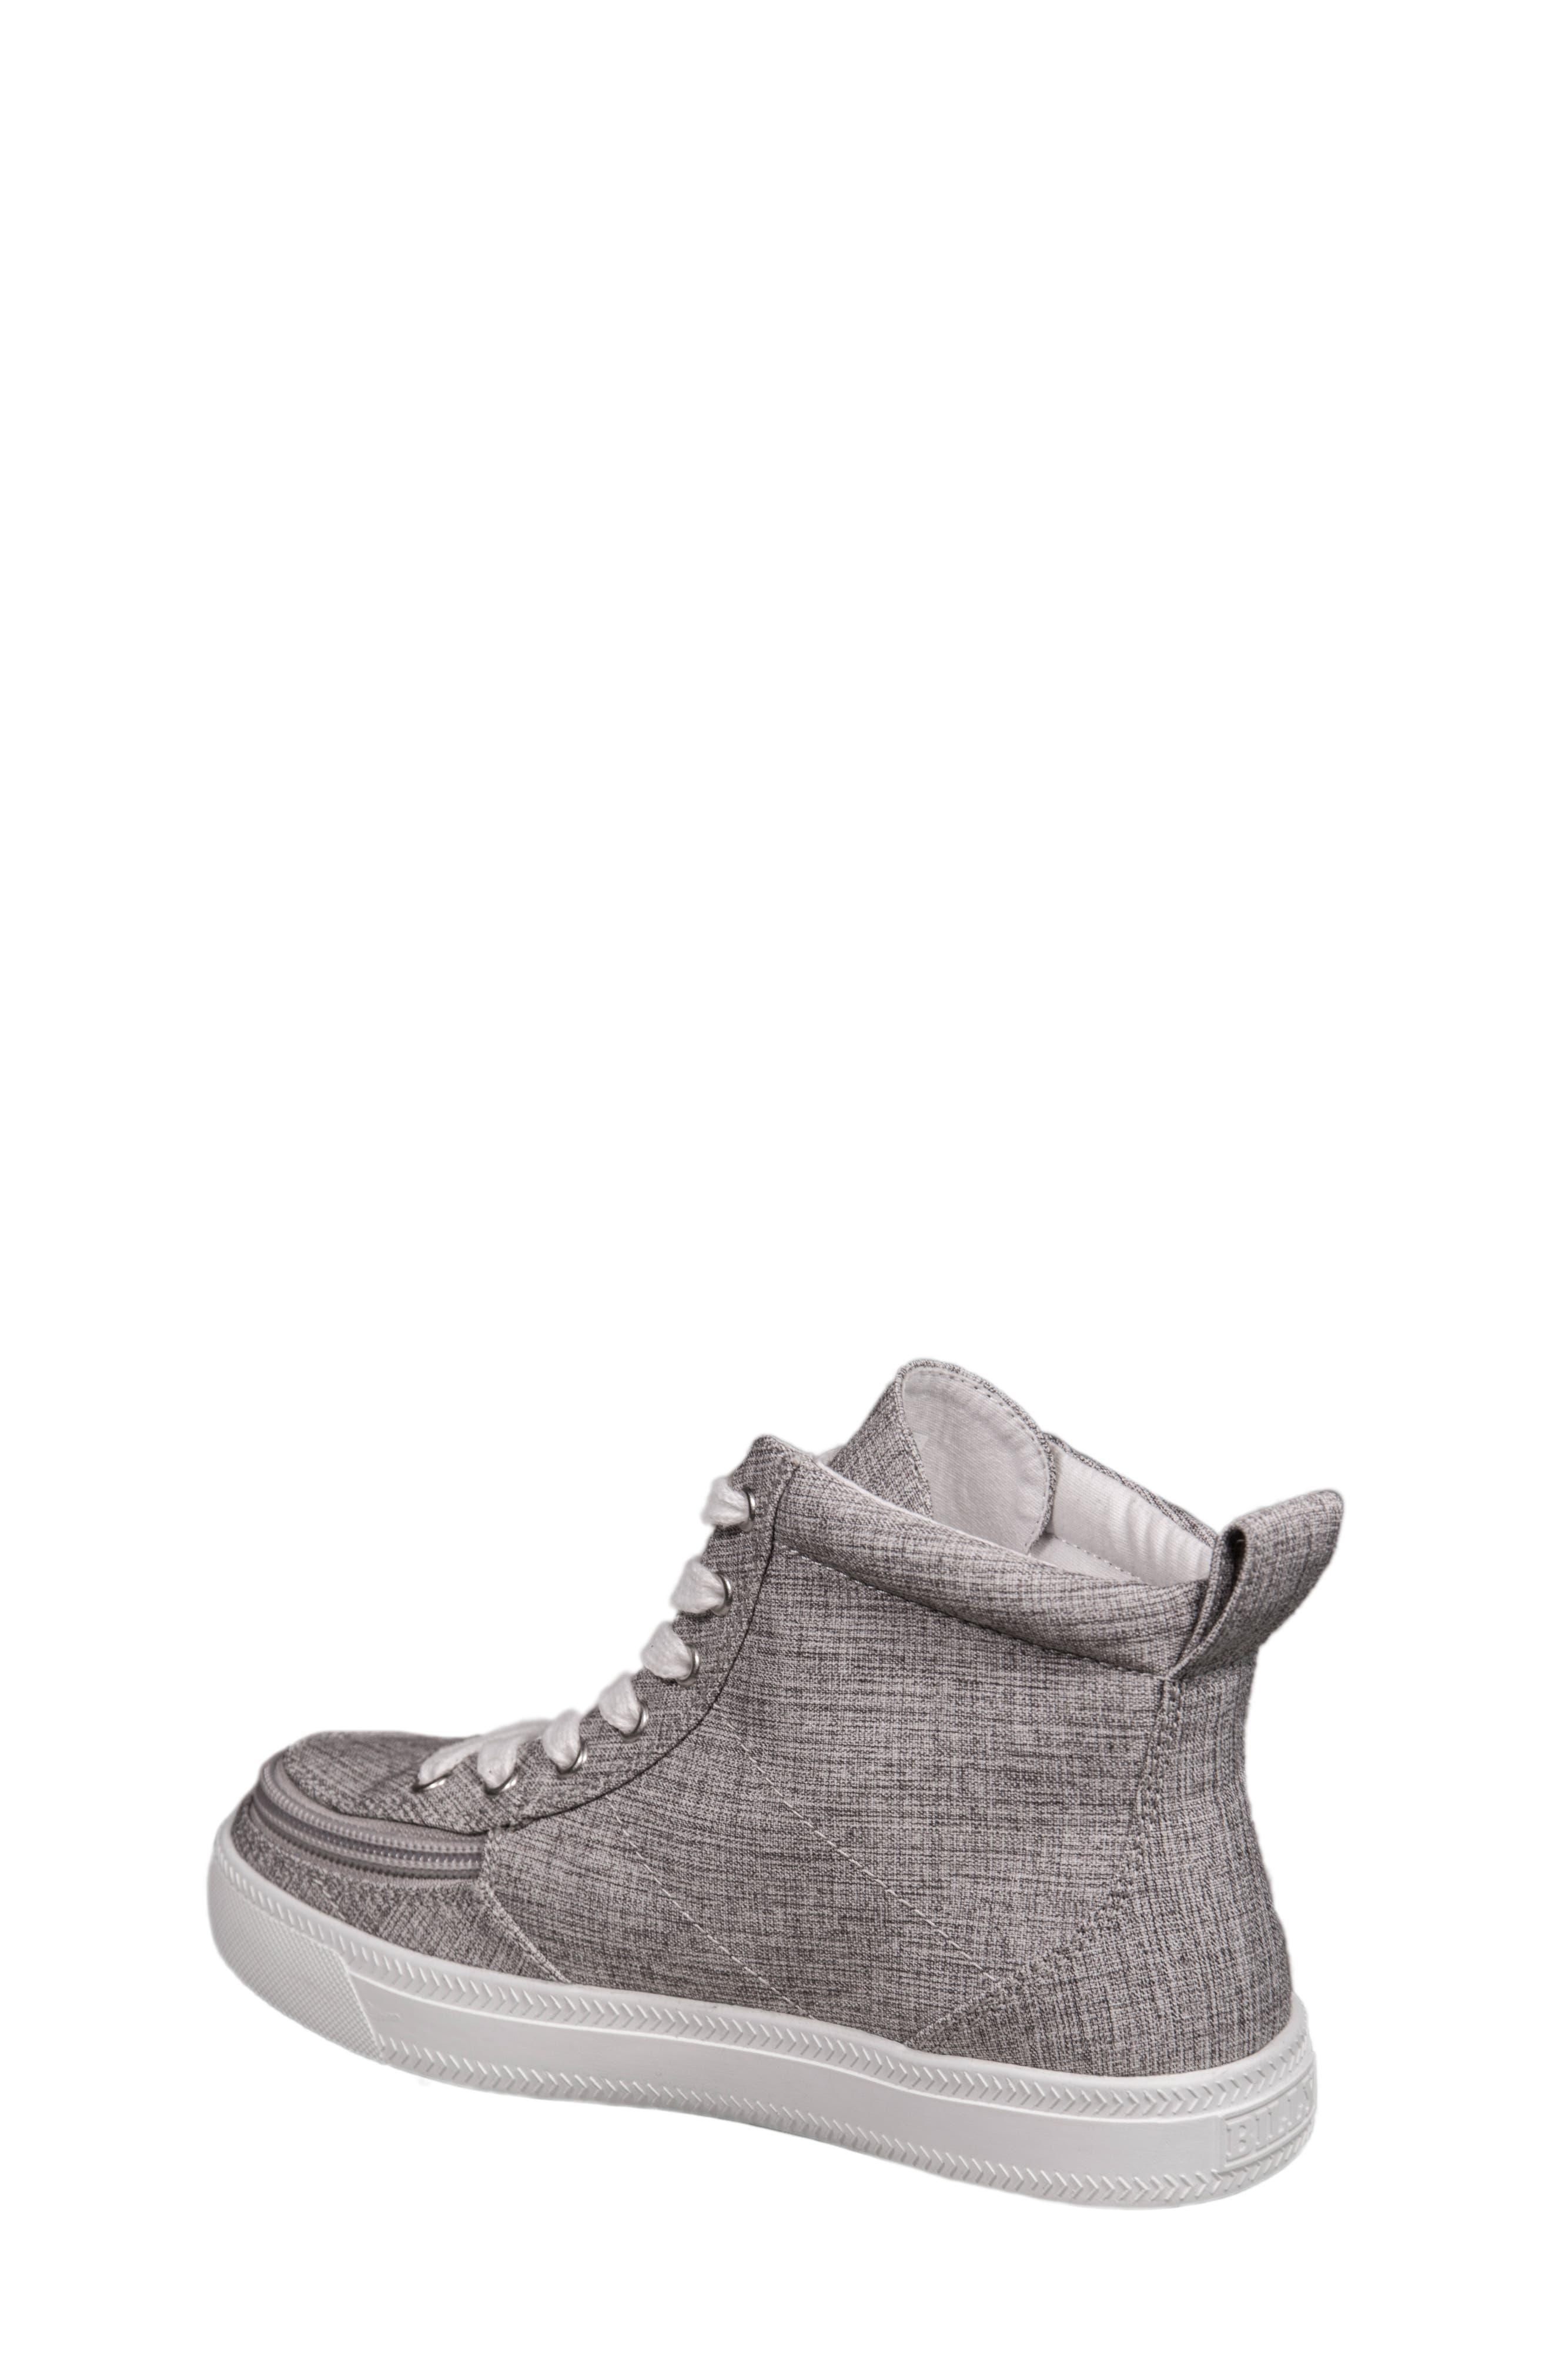 Zip Around High Top Sneaker,                             Alternate thumbnail 2, color,                             GREY JERSEY